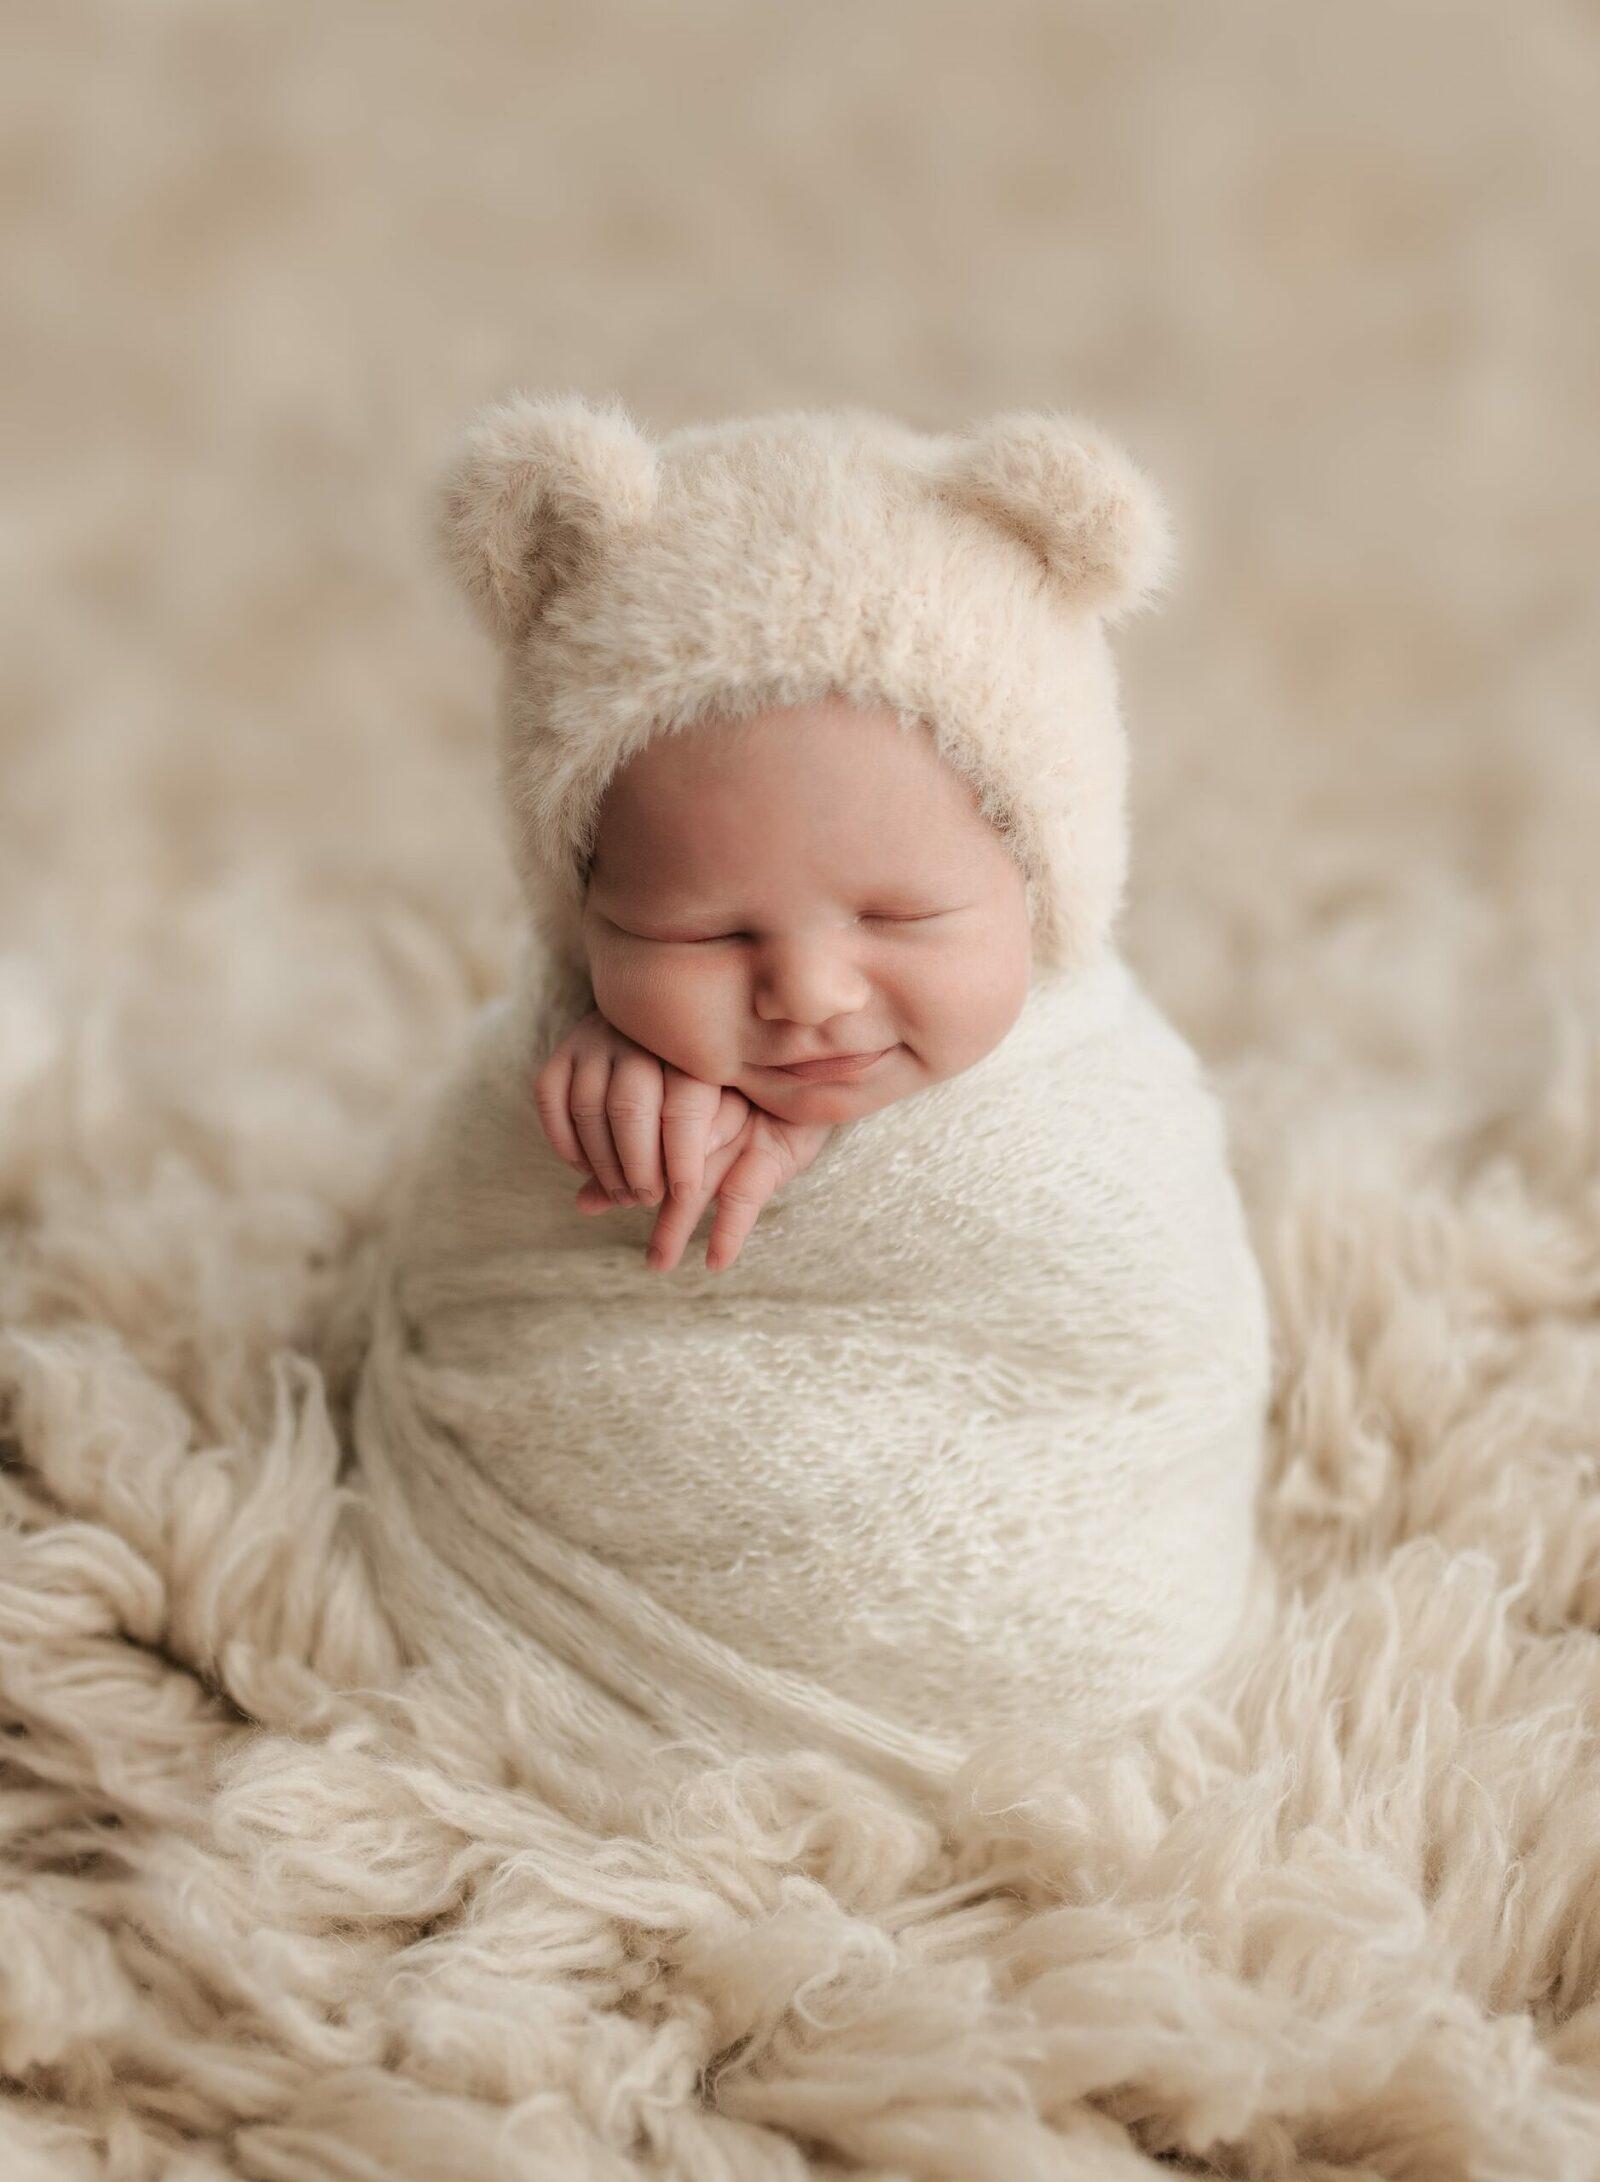 newborn baby boy in potato sack pose on ivory flokati fur with fuzzy bear bonnet